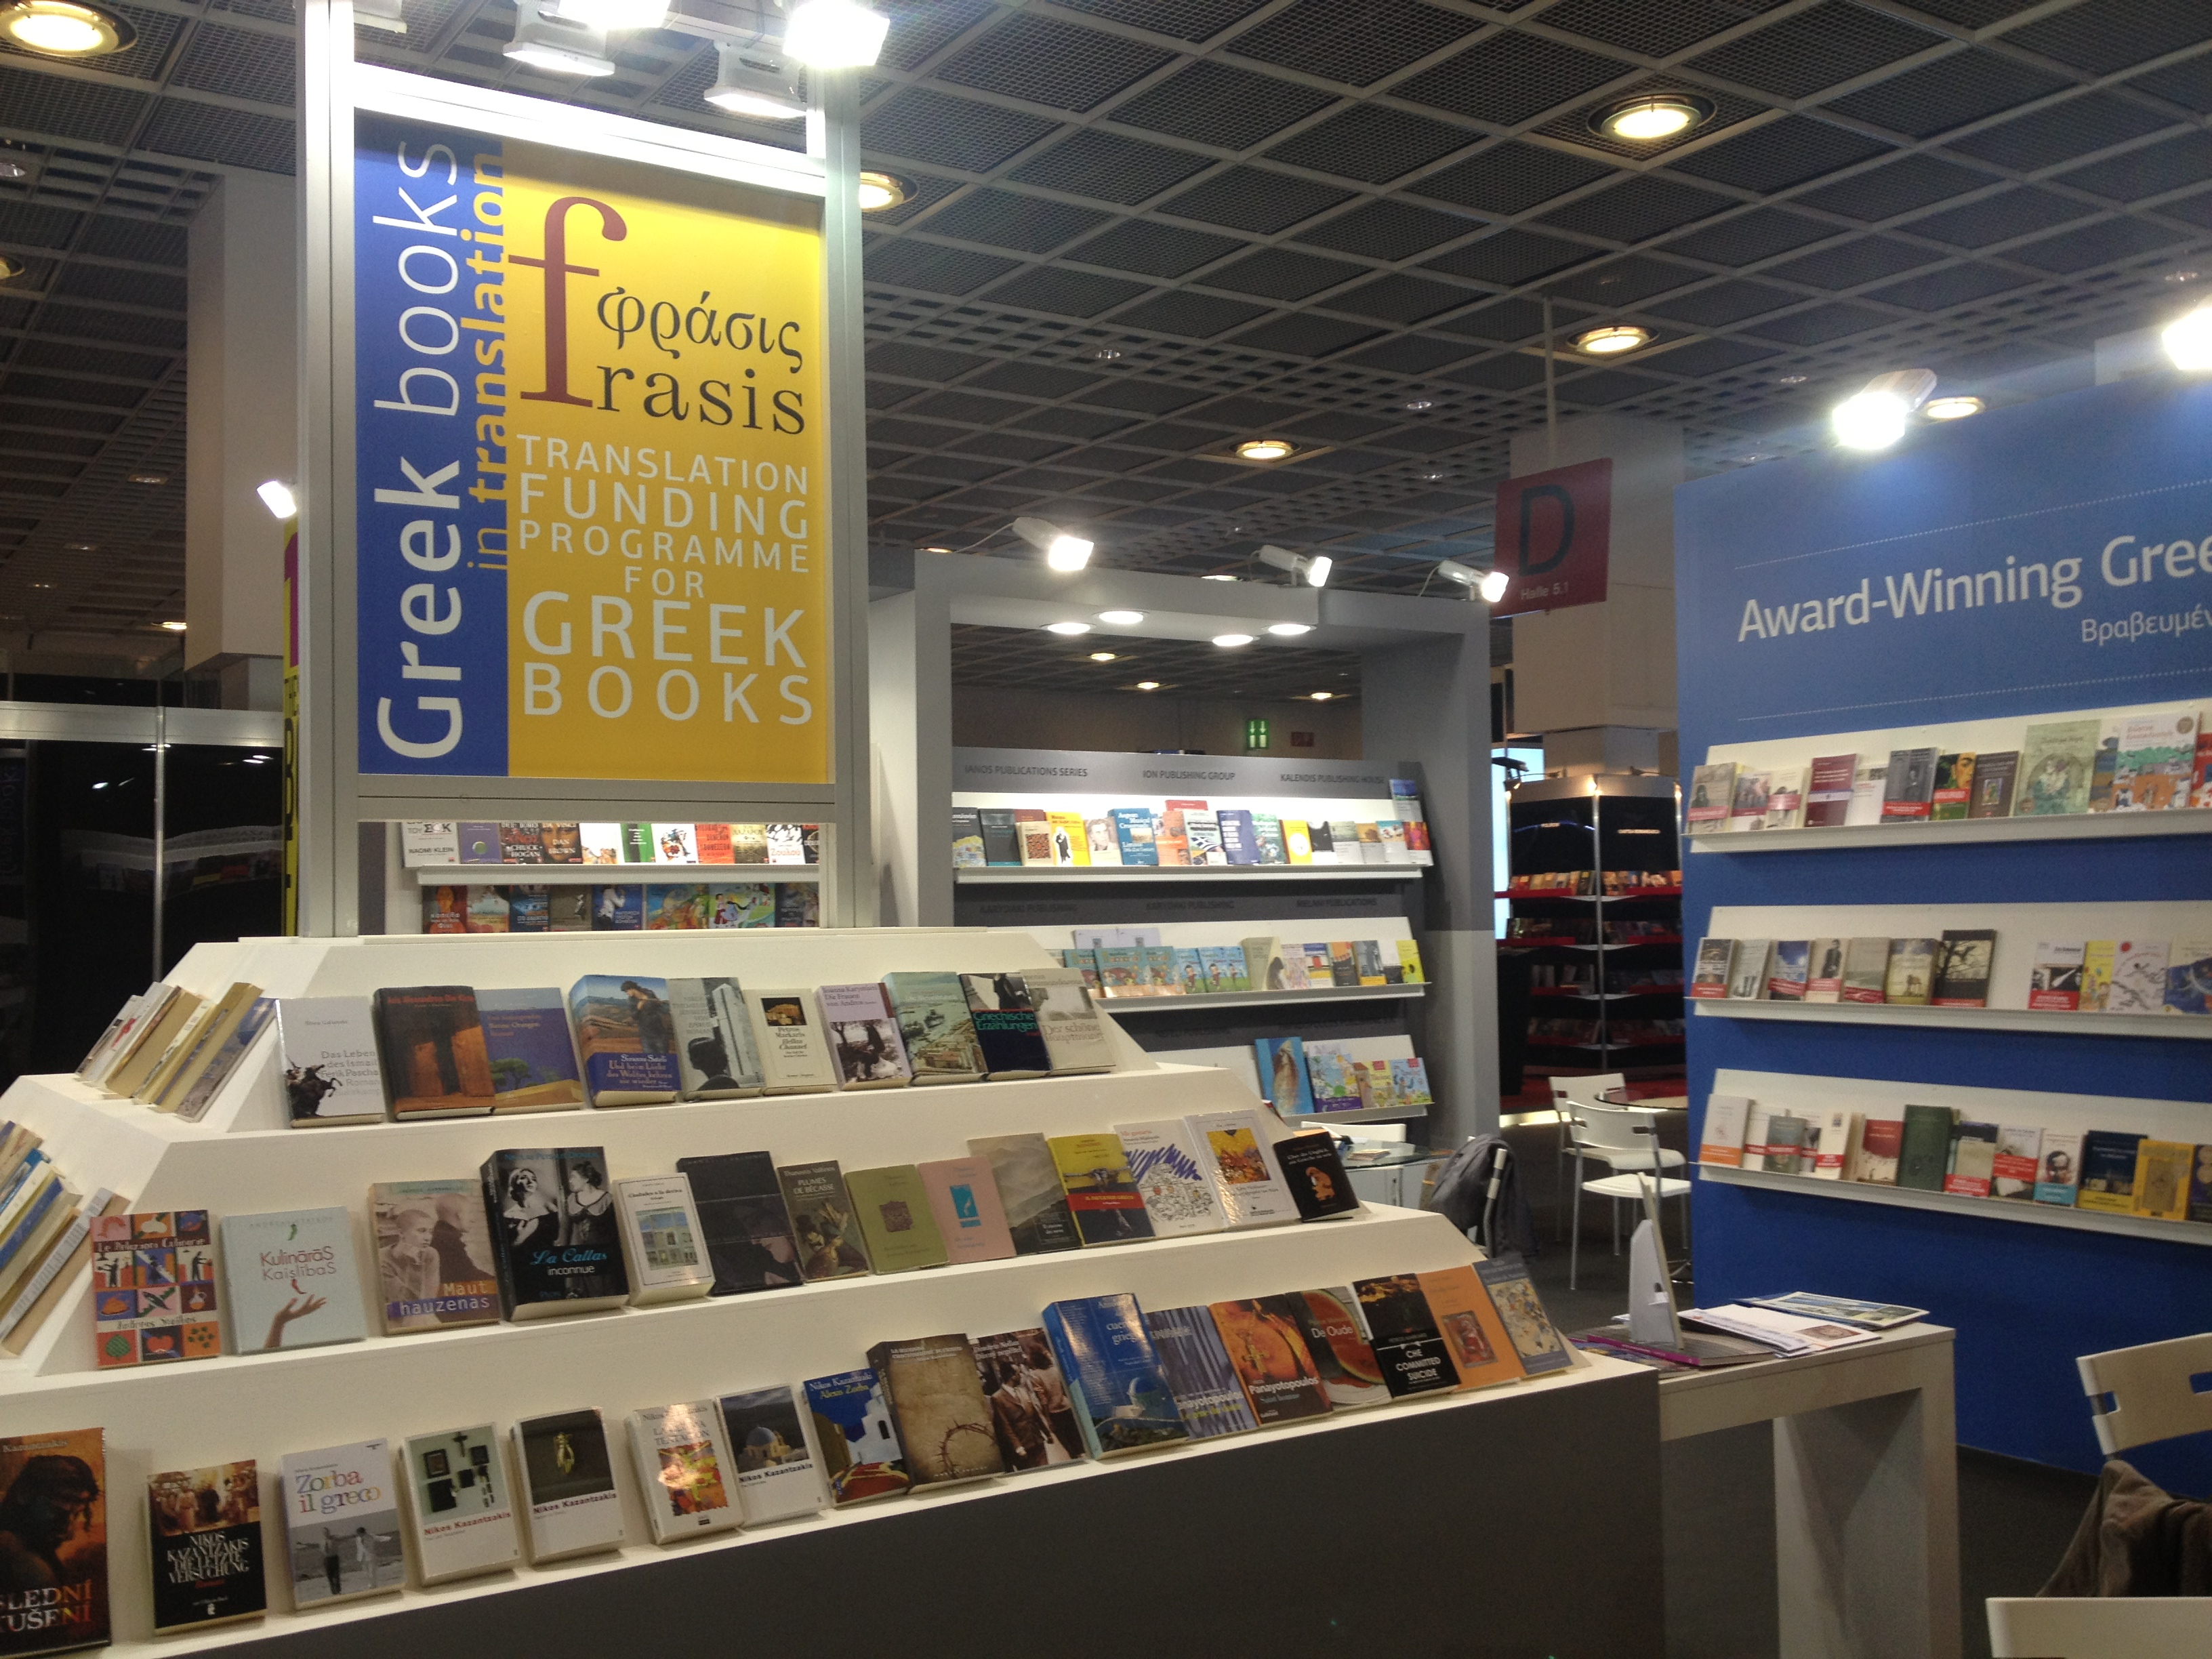 Frankfurt Book Fair, 2012